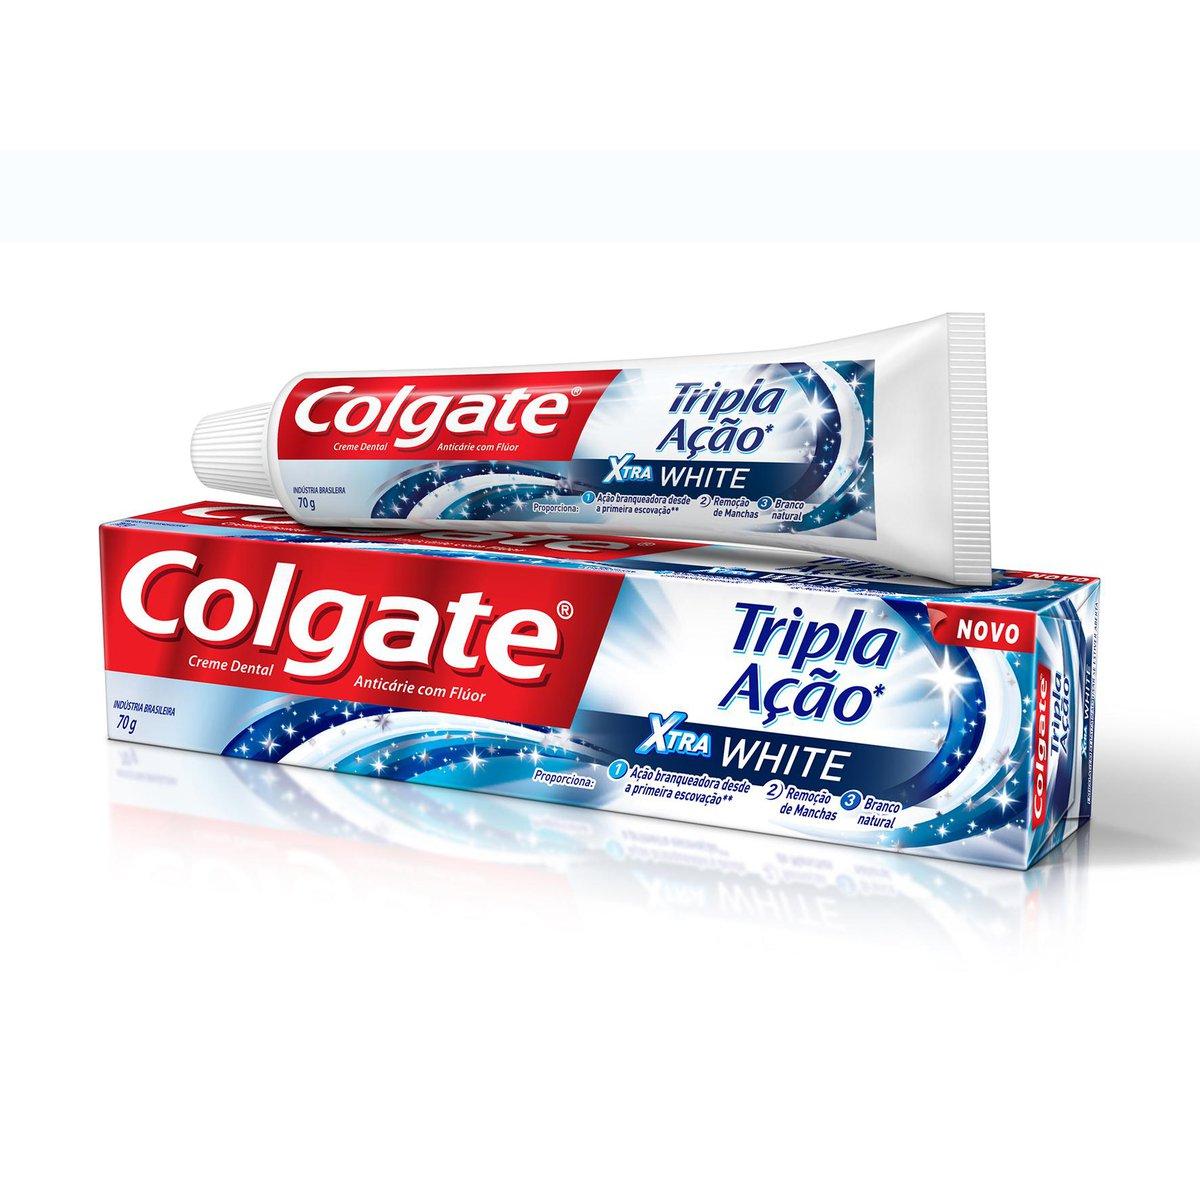 CR DENT COLG T ACAO X WHITE 1X70G(144)